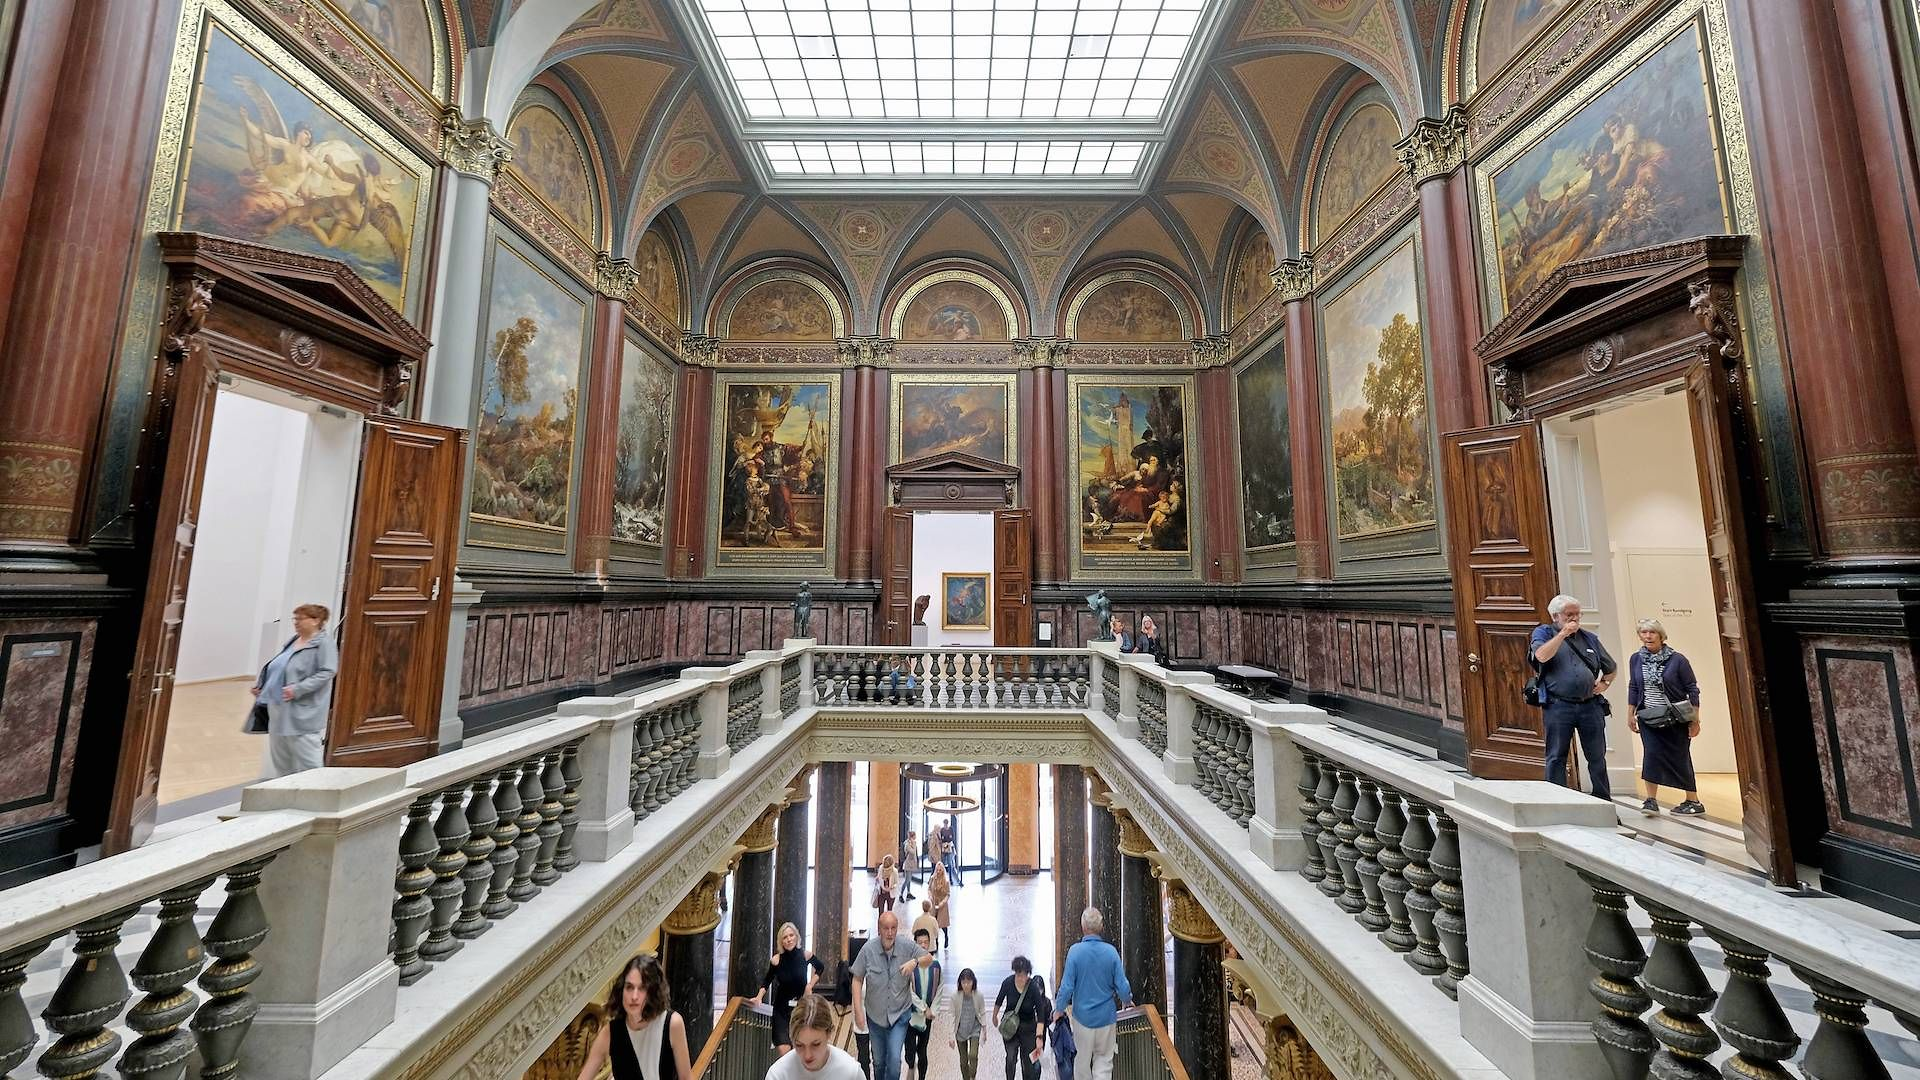 Corona Hamburgs digitale Kulturangebote – Wir bleiben zuhause ...